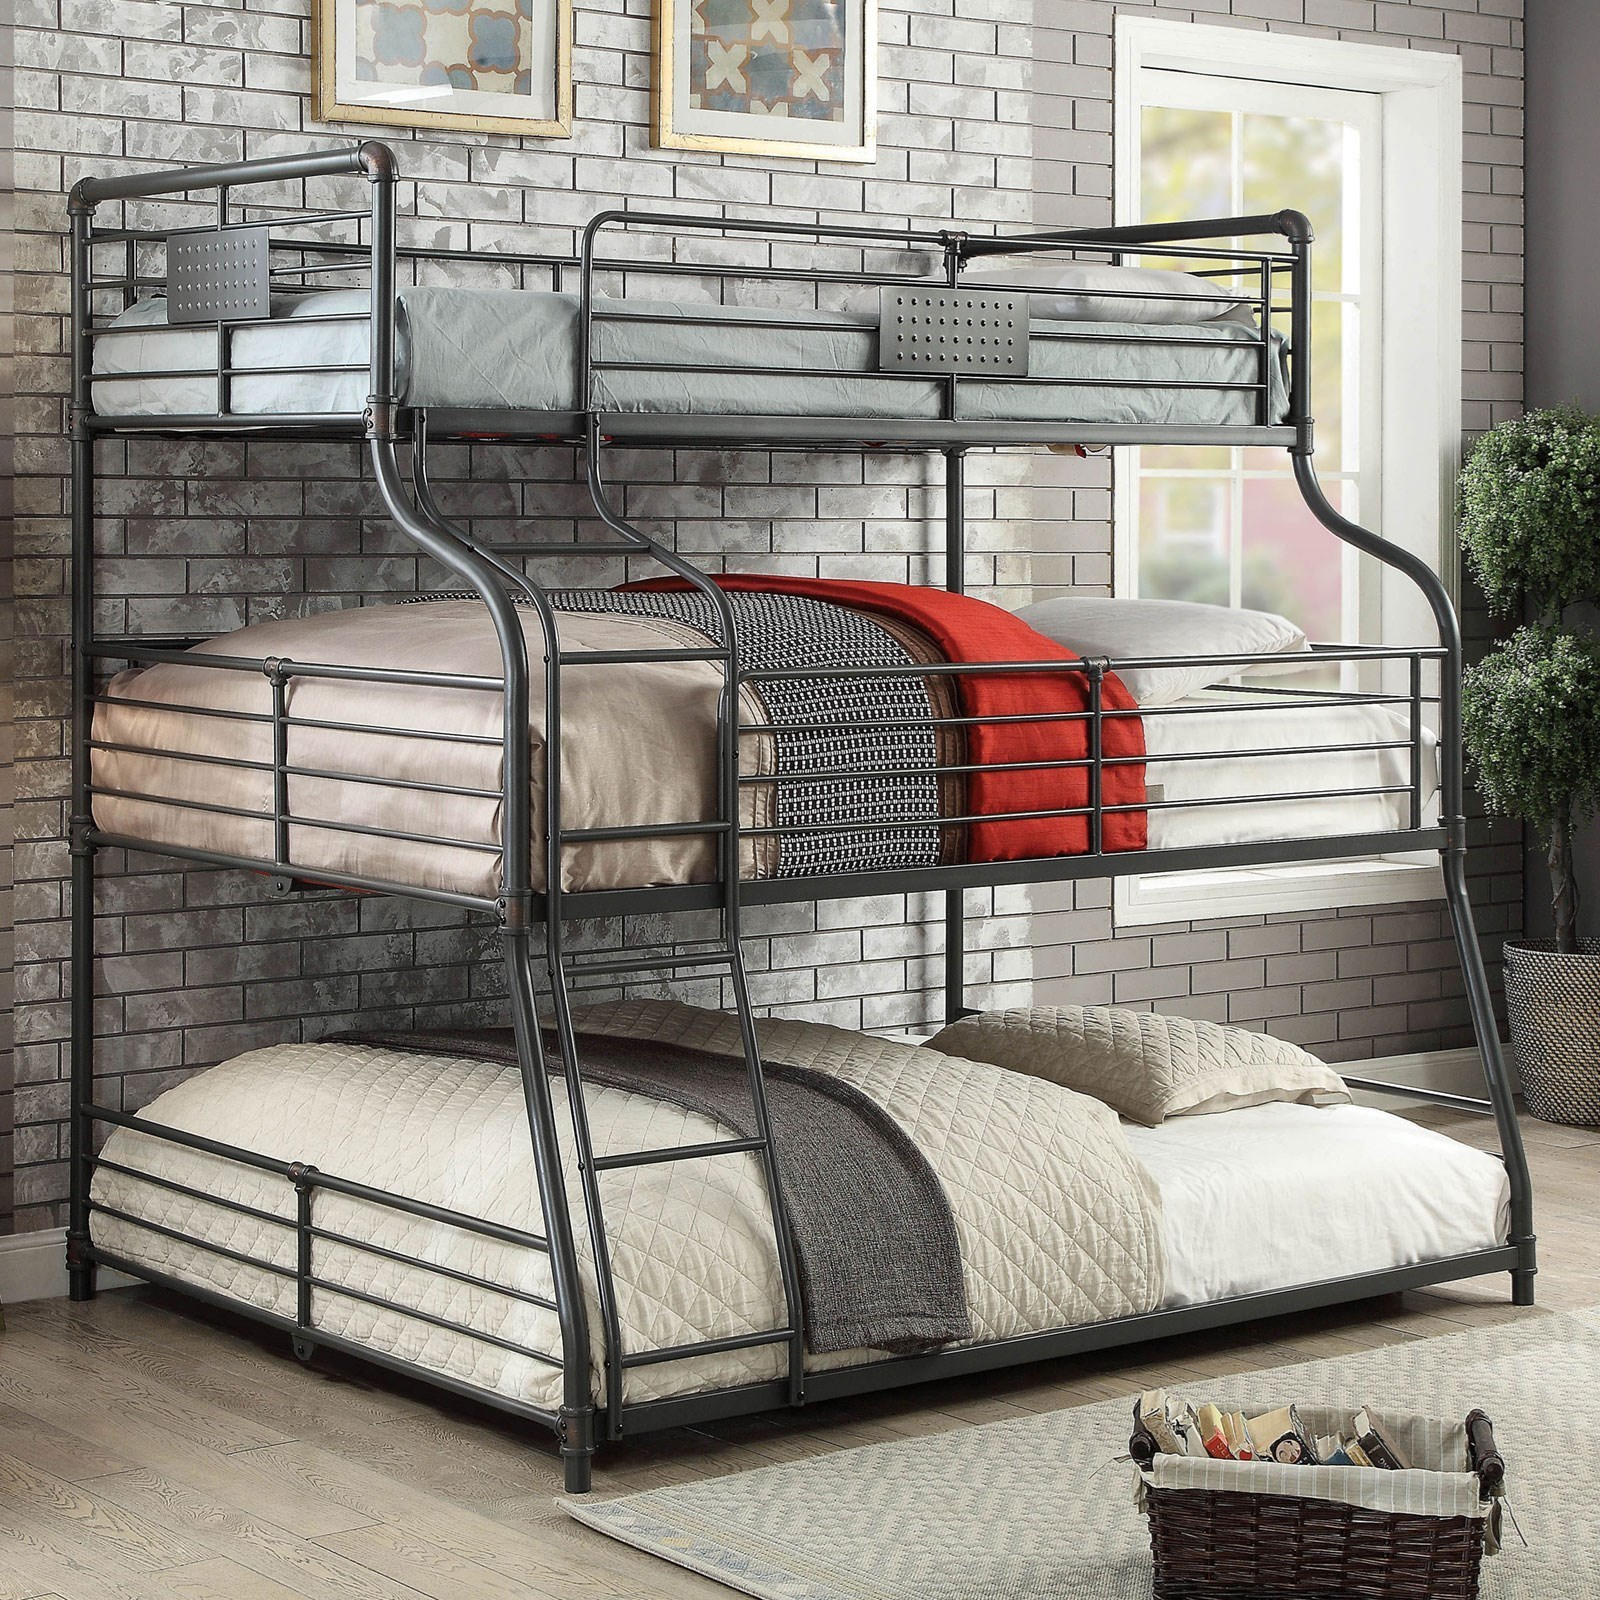 Olga III Twin/Full/Queen Bunk Bed at Household Furniture